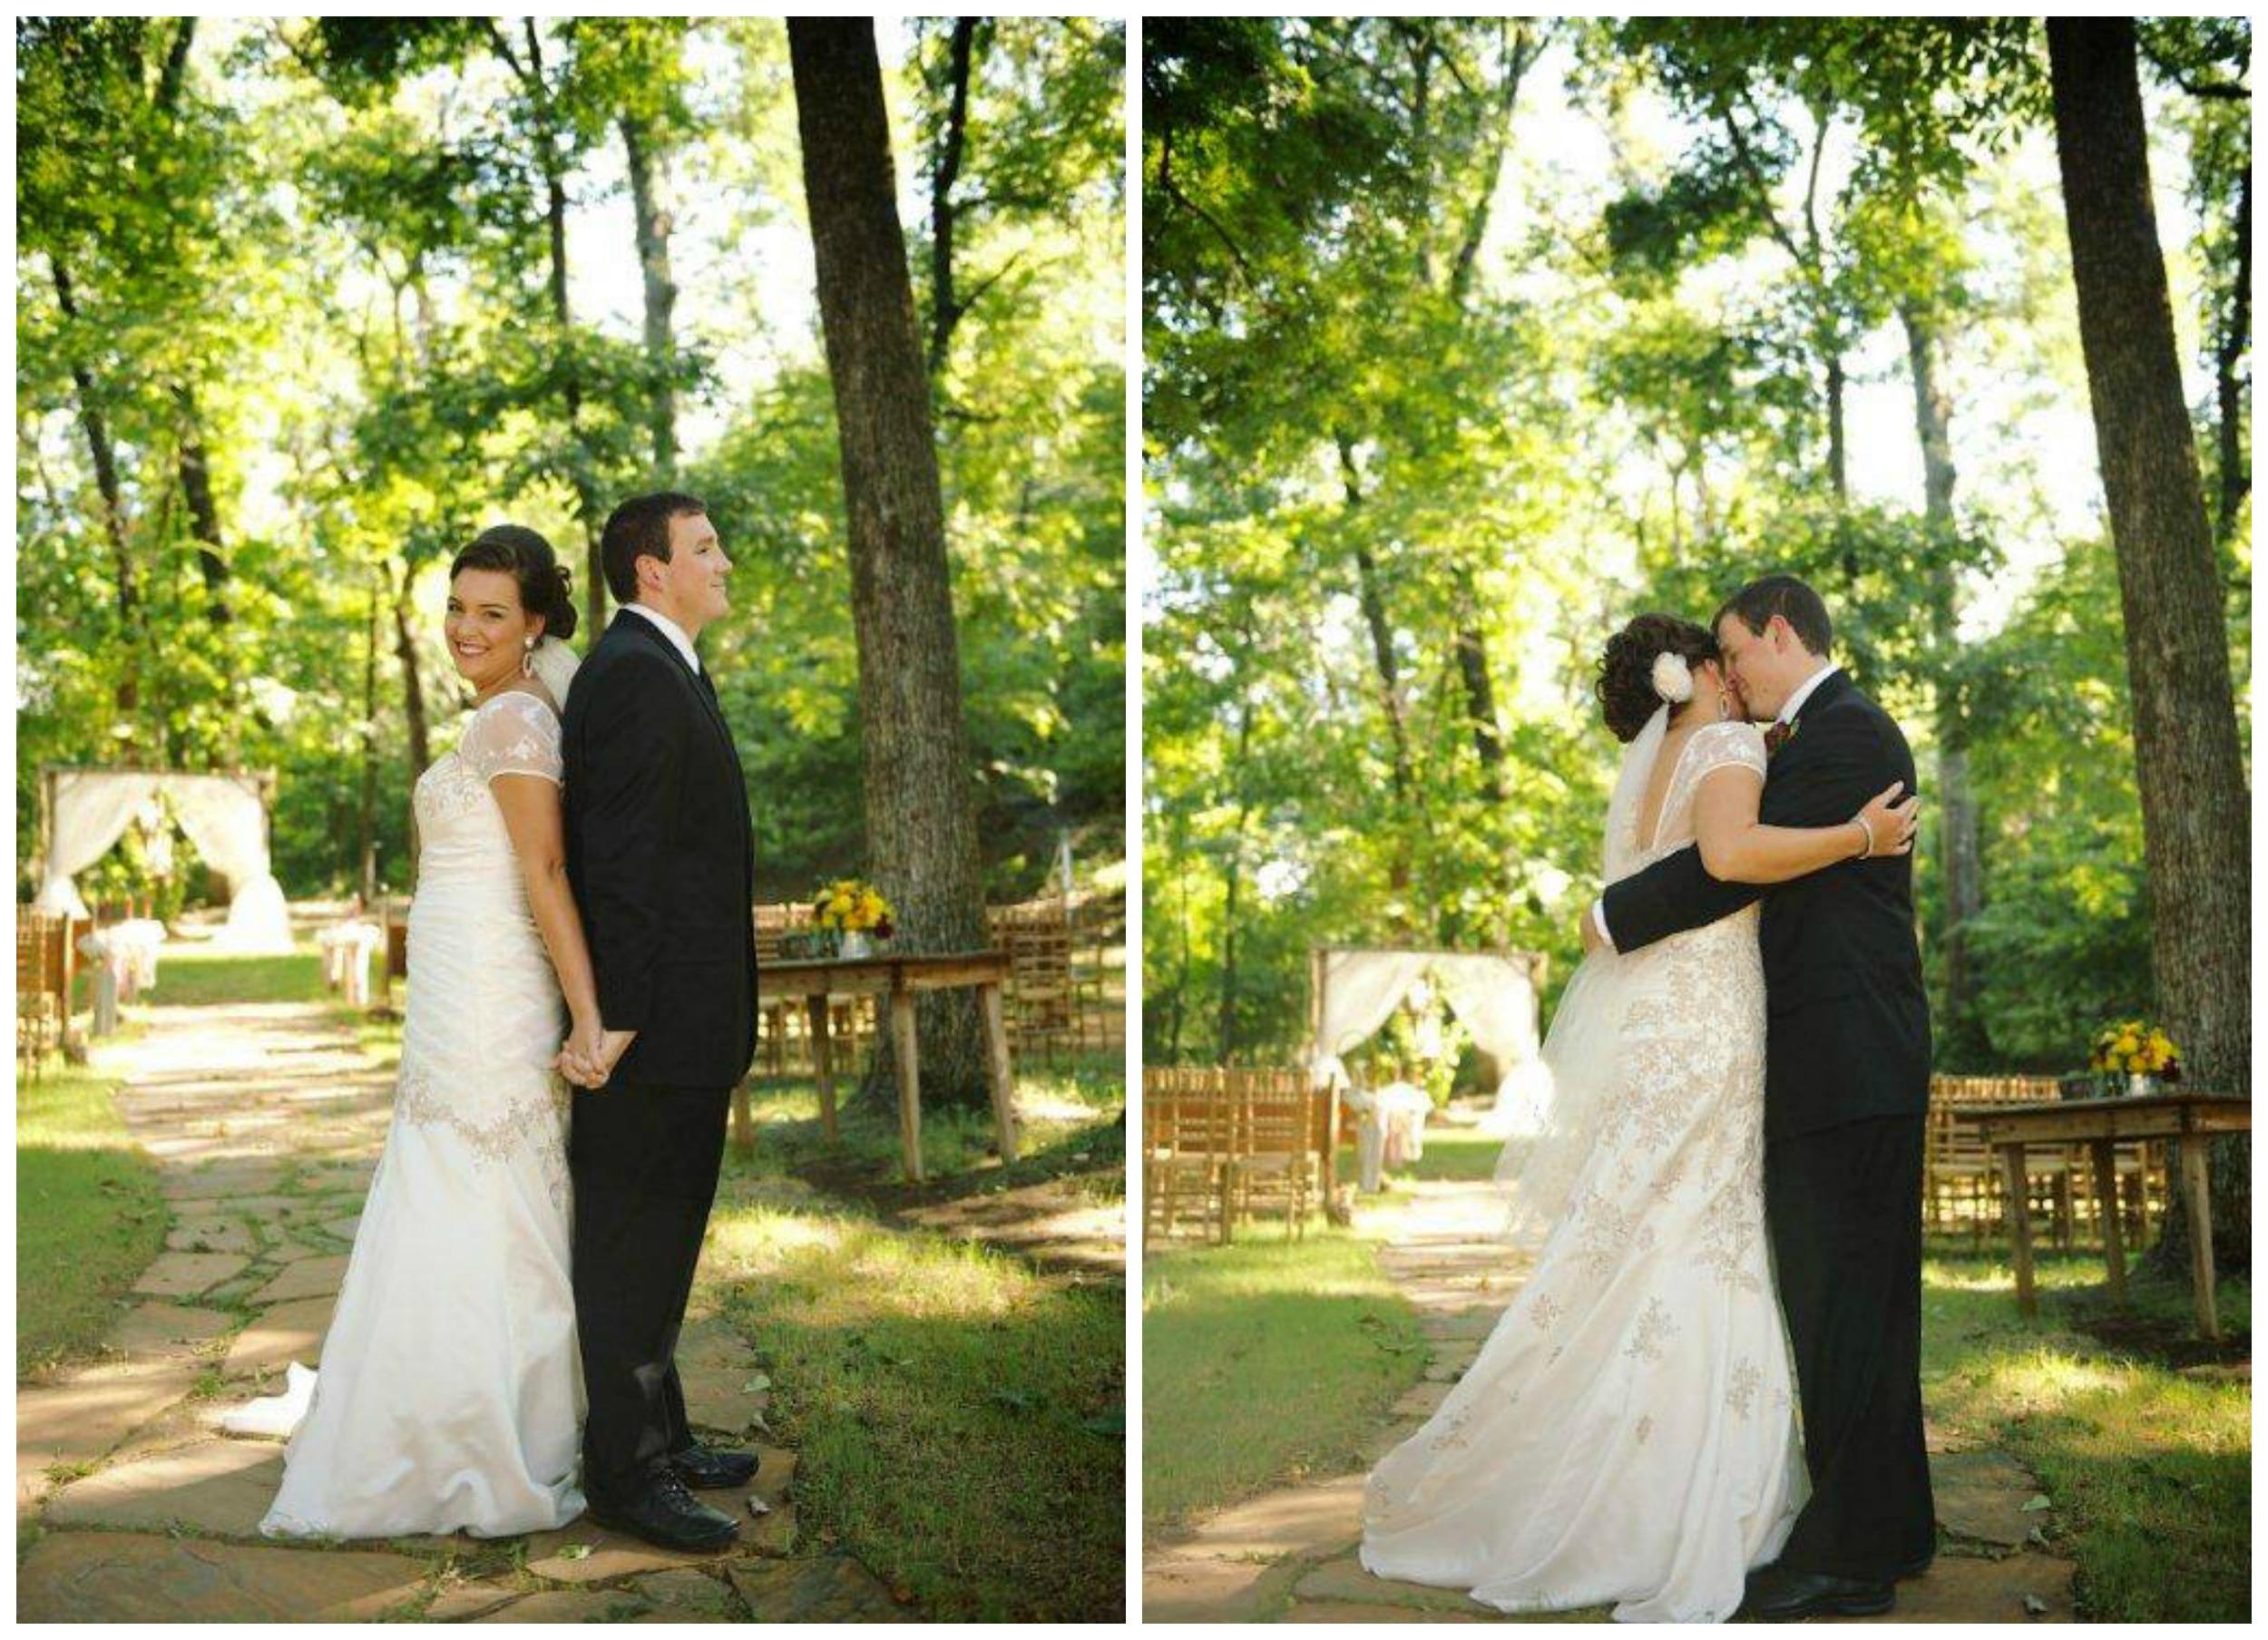 BnBauman Photography , from  Chelsea + Logan 's wedding